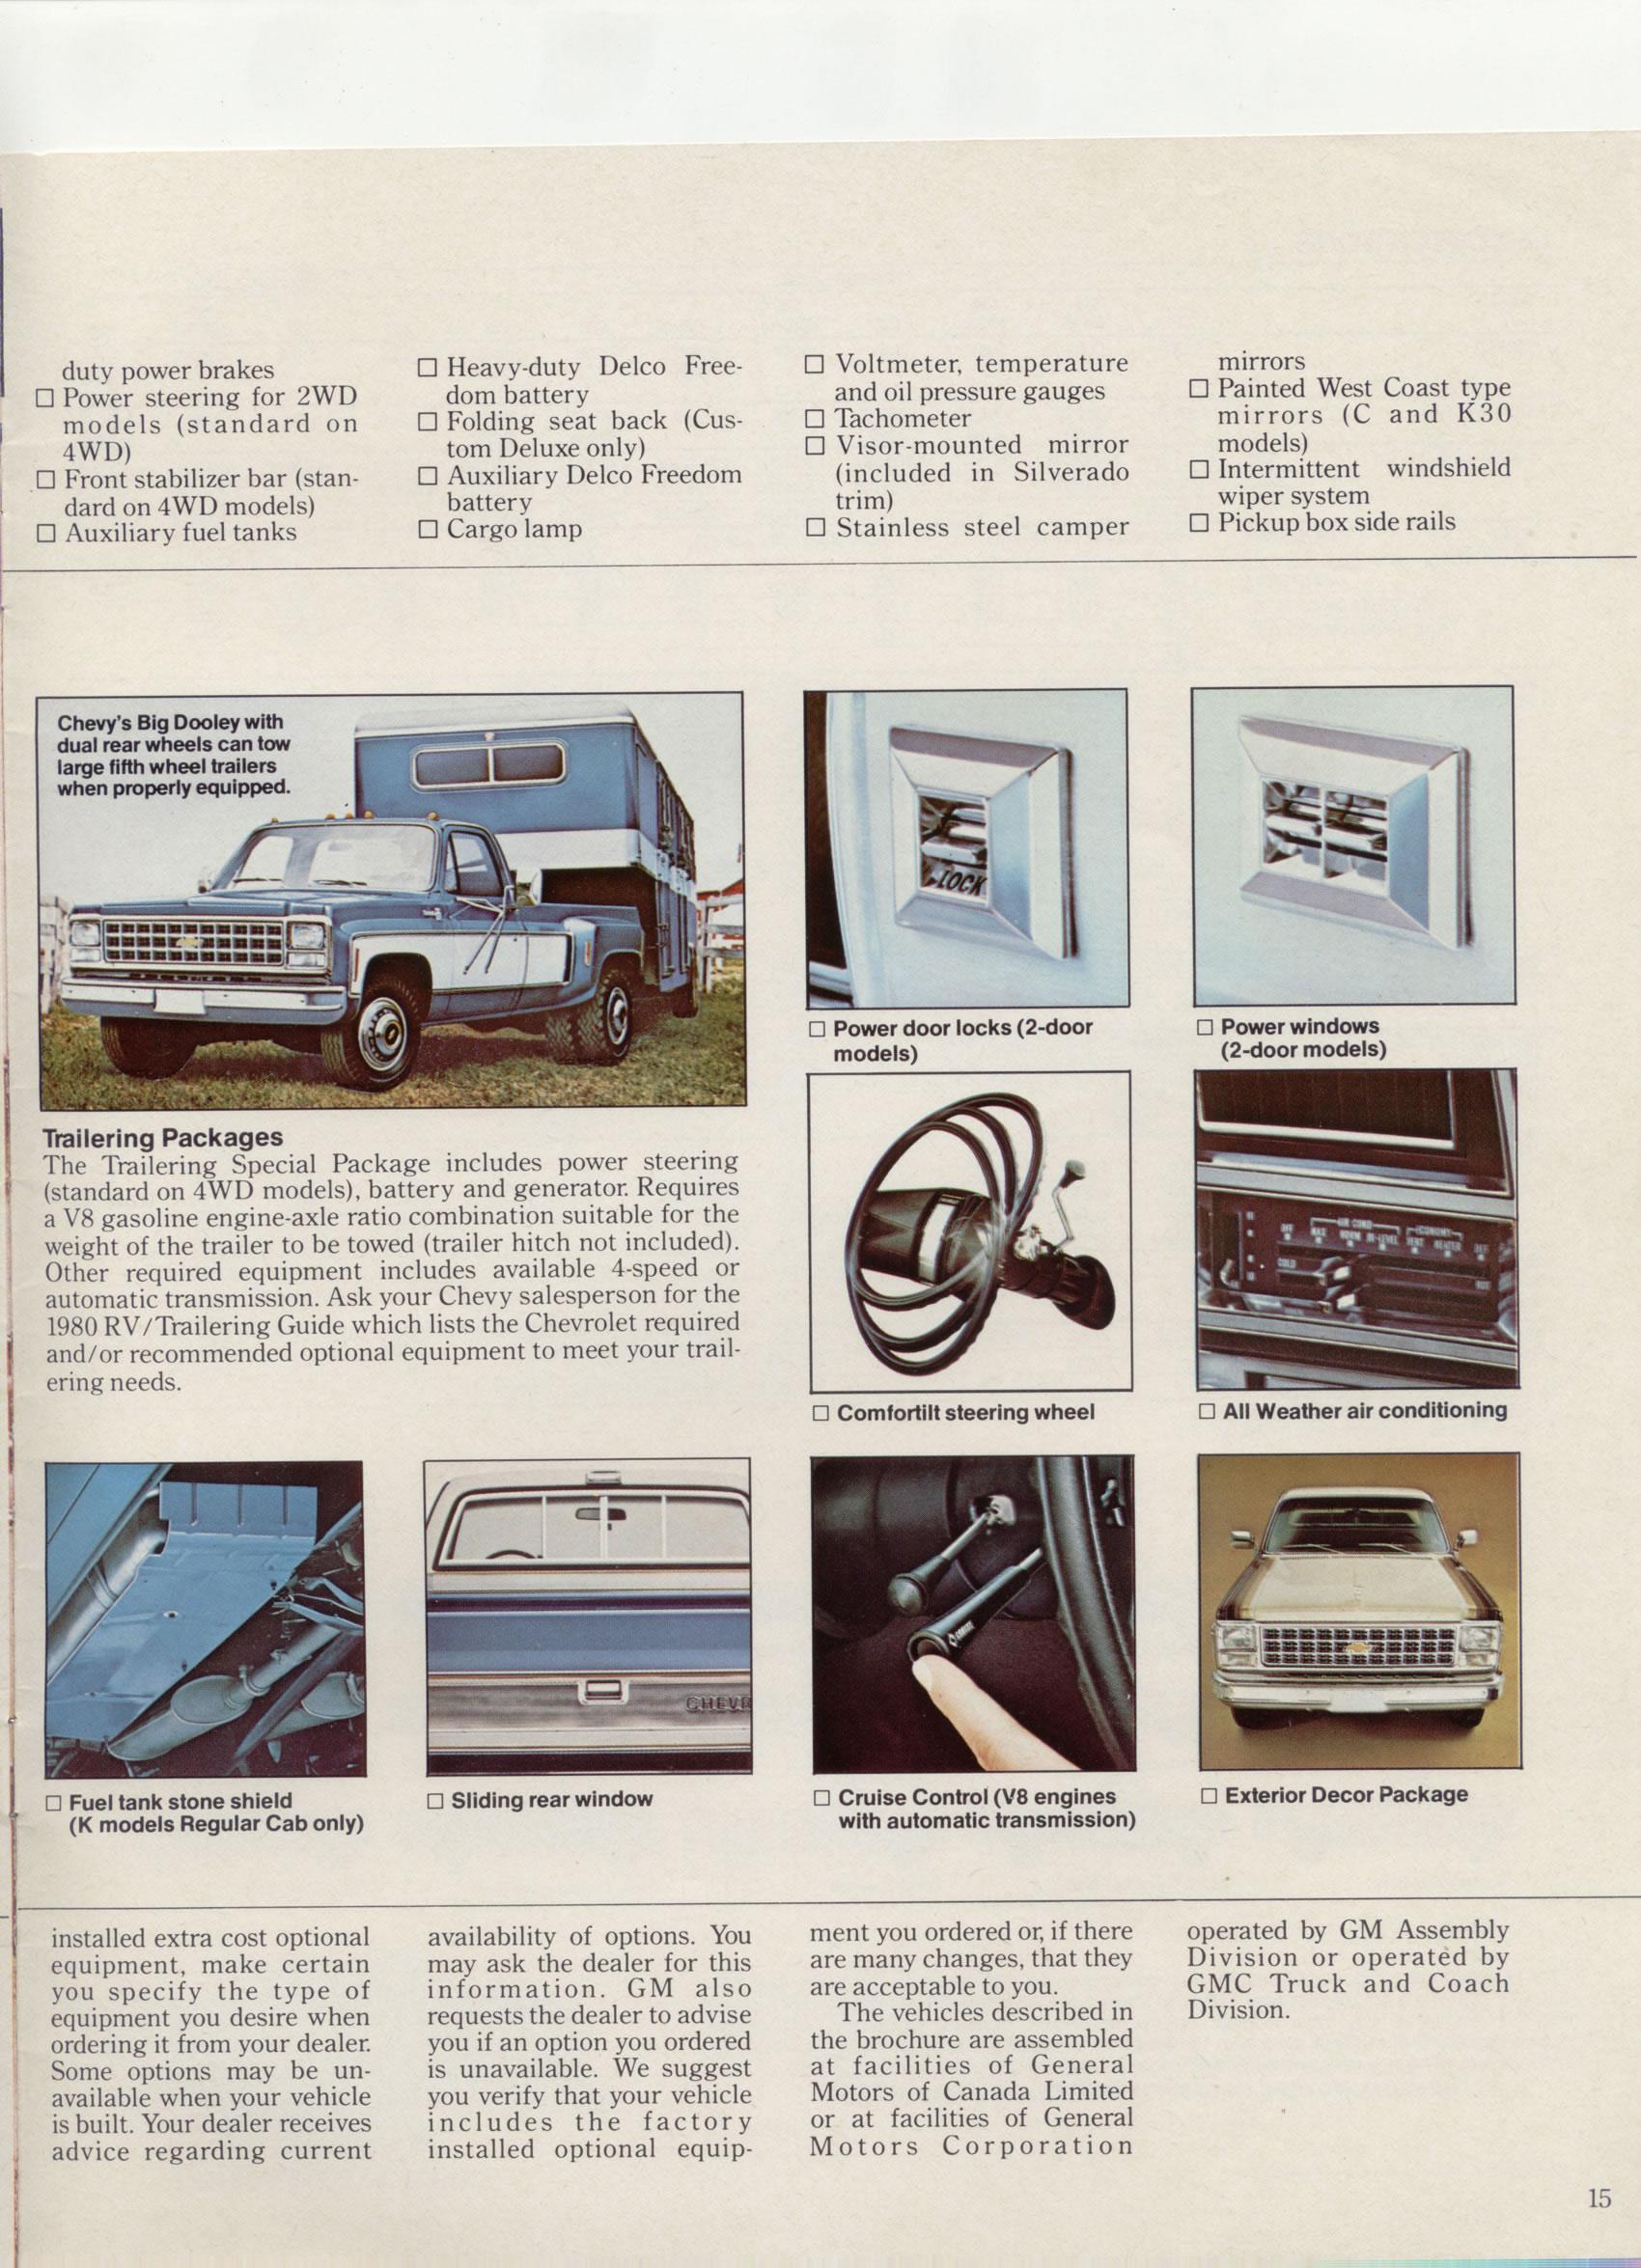 Old Chevrolet Pickups >> 1980 Chevrolet Pickups / ChevPickup1980page15.jpg